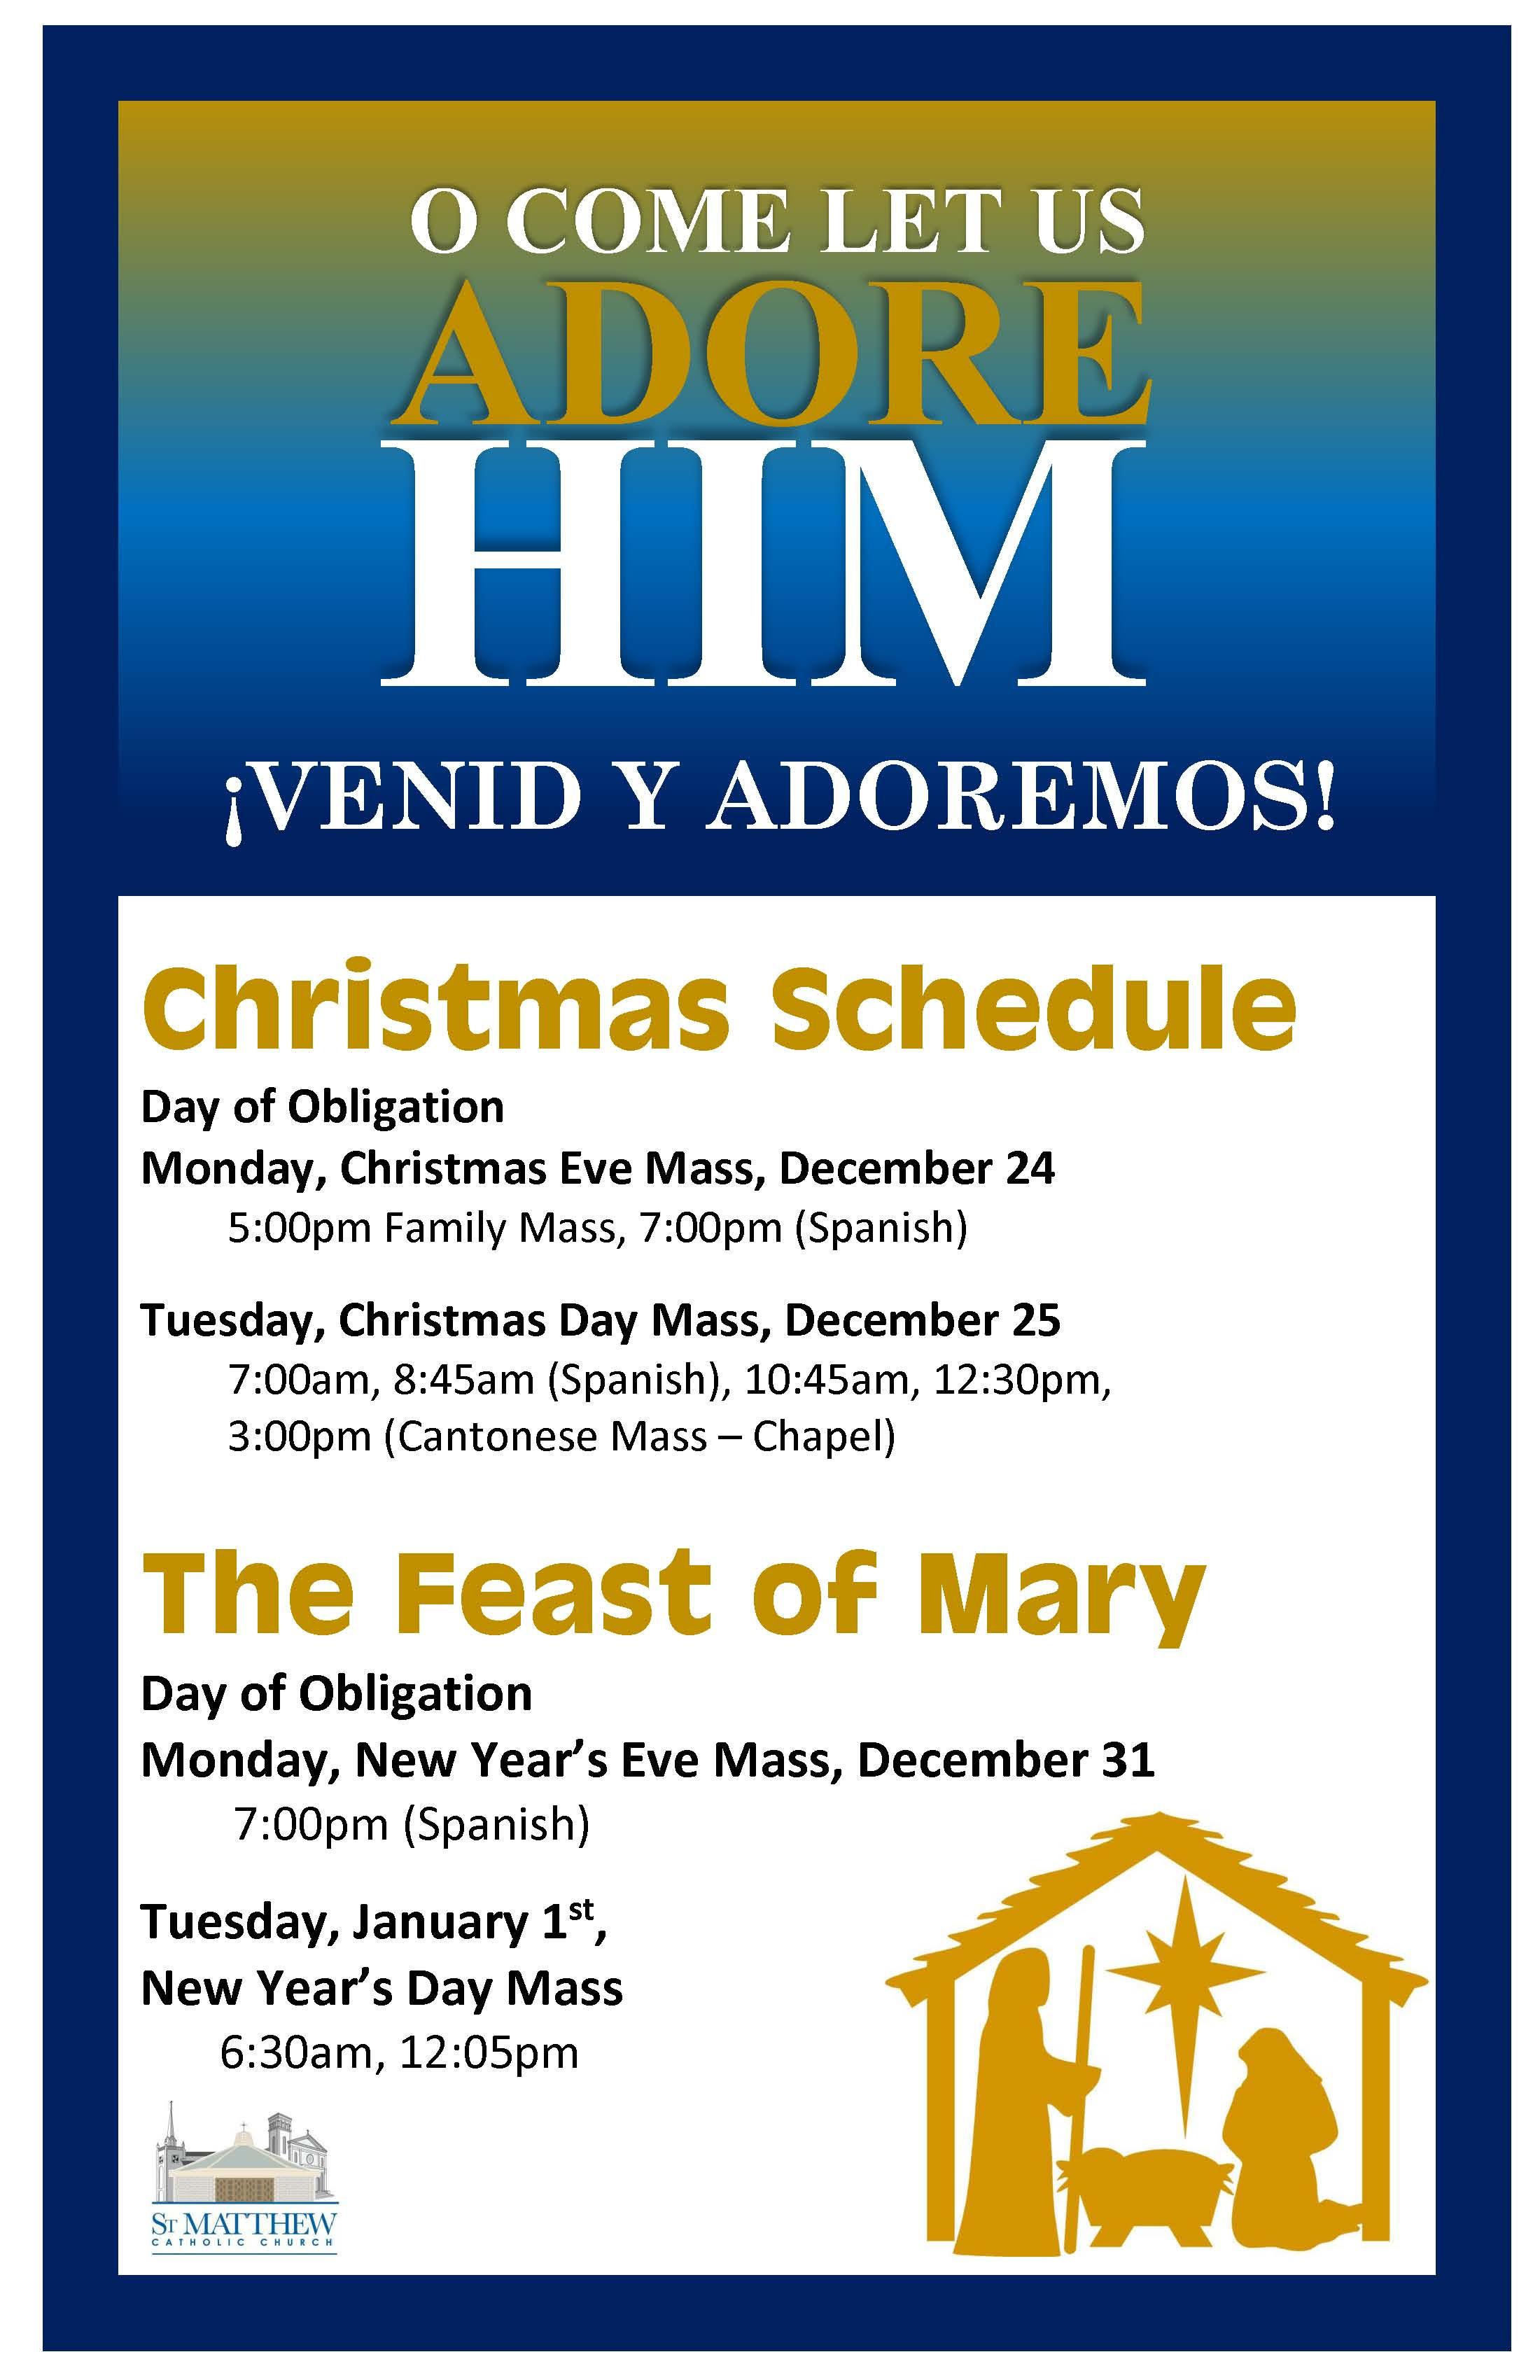 st. matthew catholic church of san mateo - news spotlight: christmas